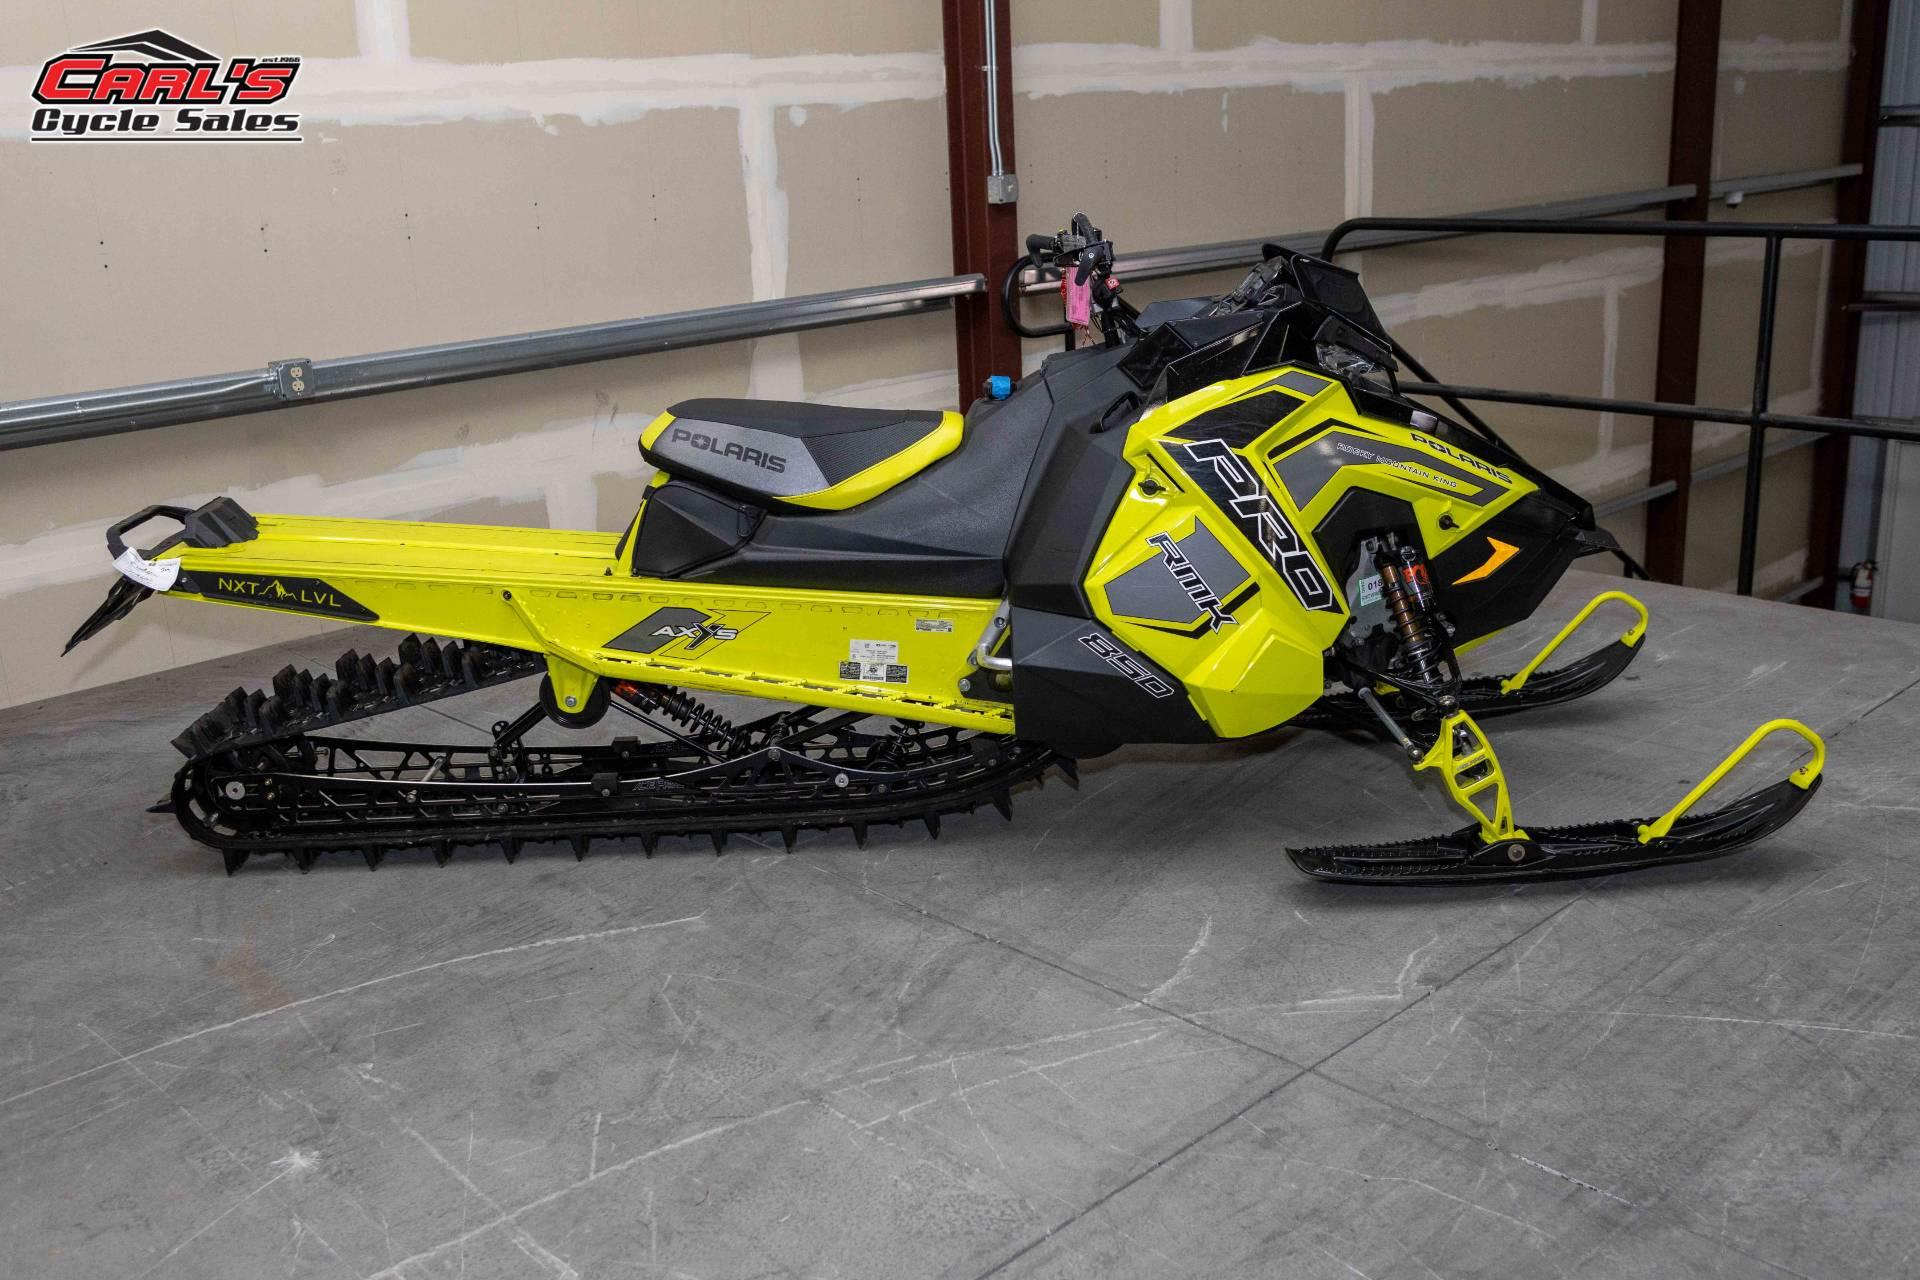 2019 Polaris 850 PRO-RMK 155 SnowCheck Select in Boise, Idaho